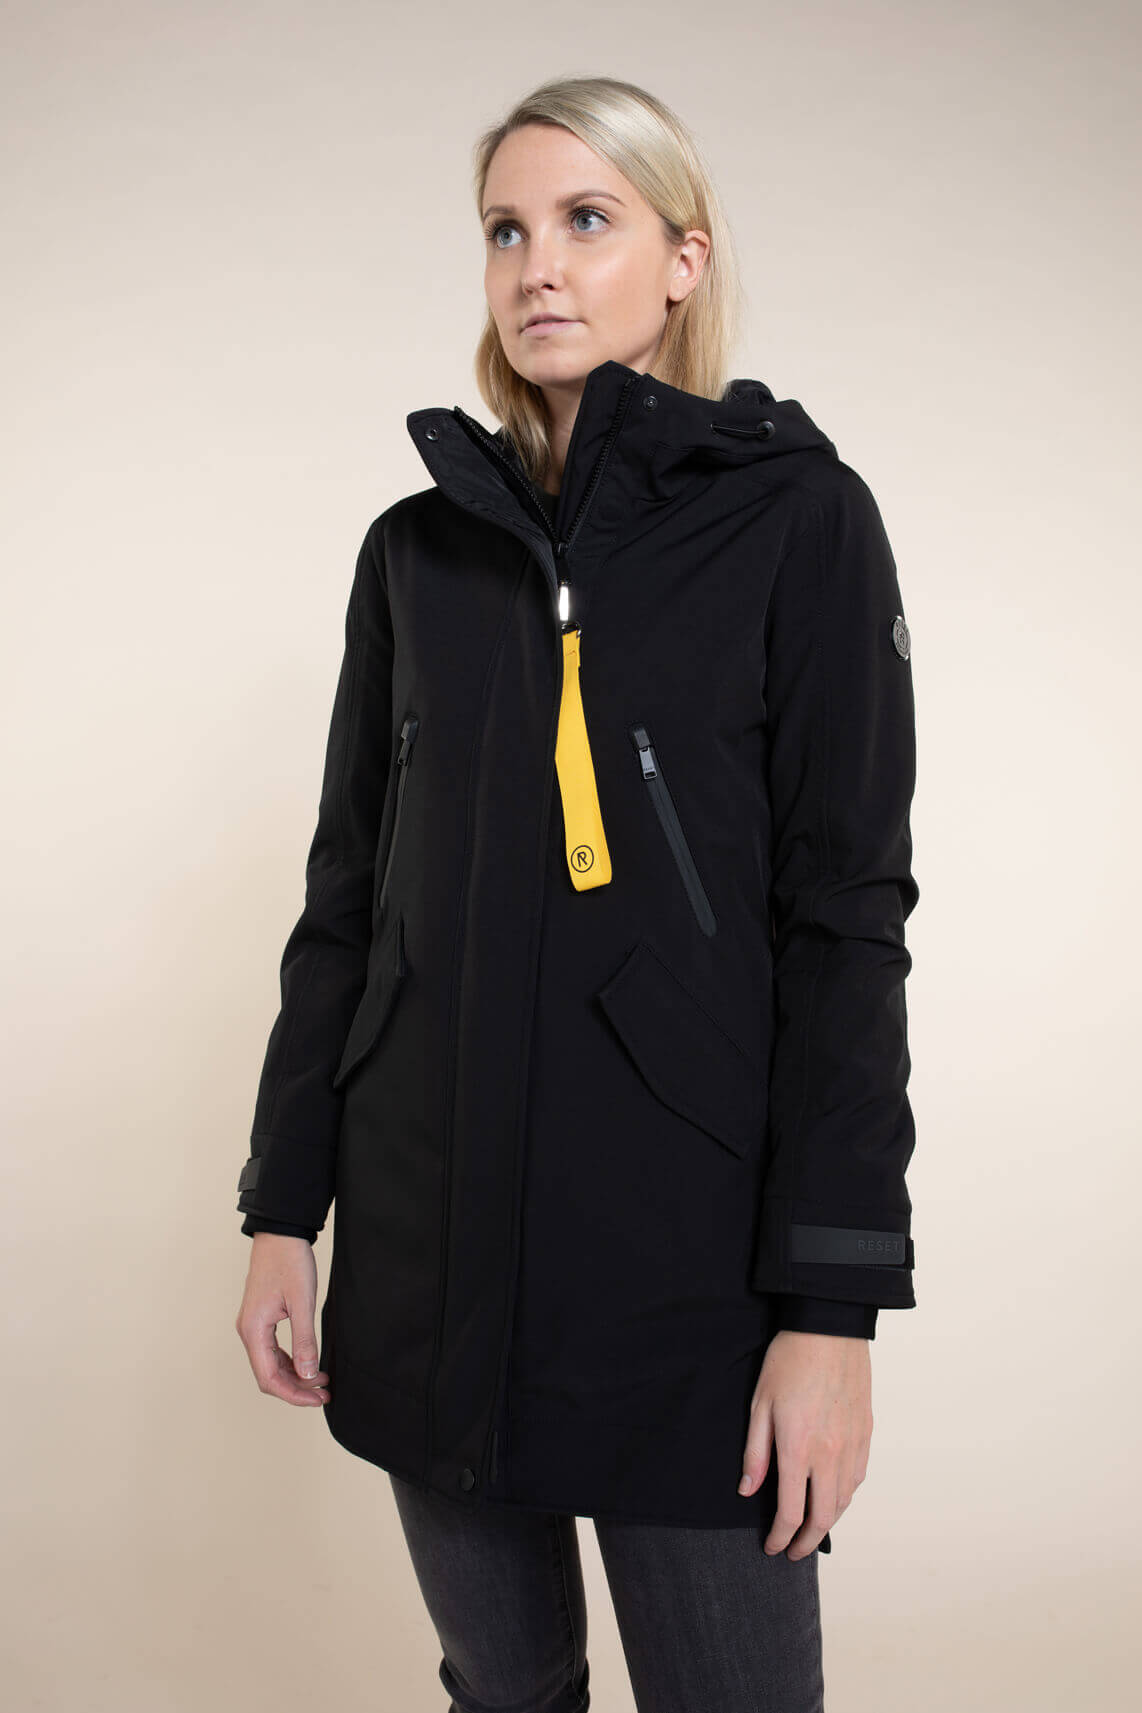 Reset Dames Mia softshell jas zwart